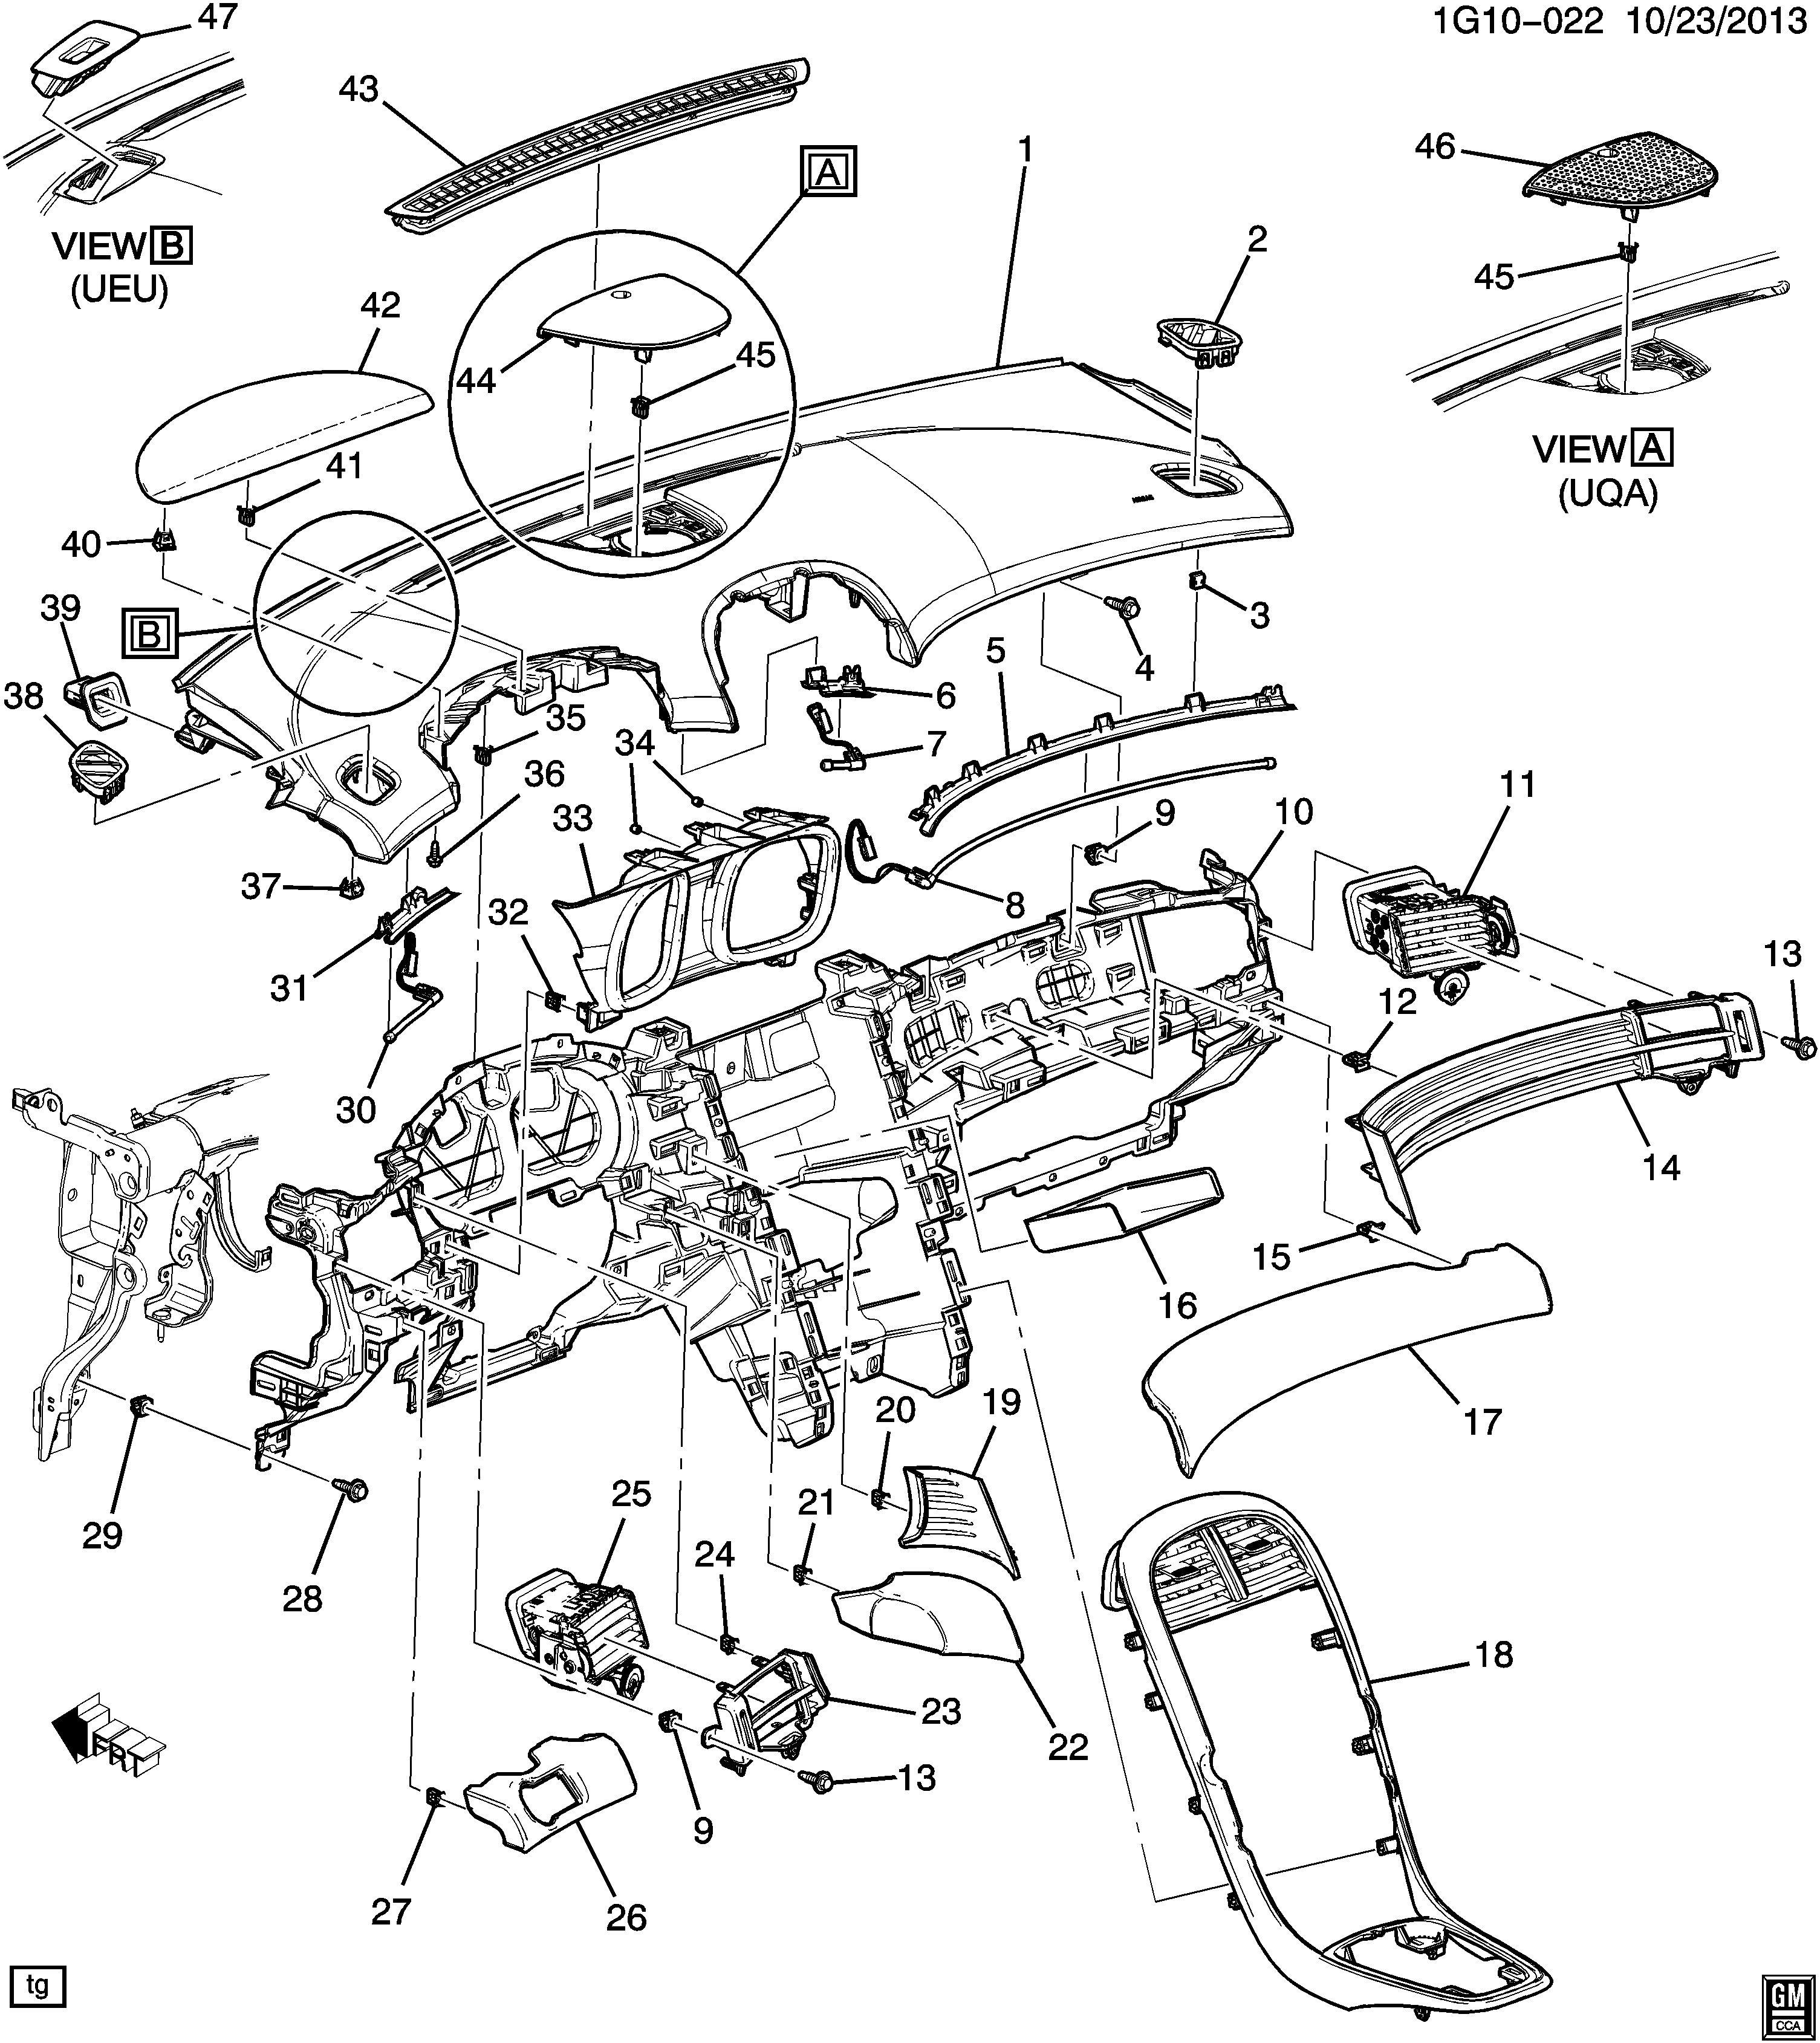 Chevrolet Malibu Instrument Panel Trim Panel (Lower